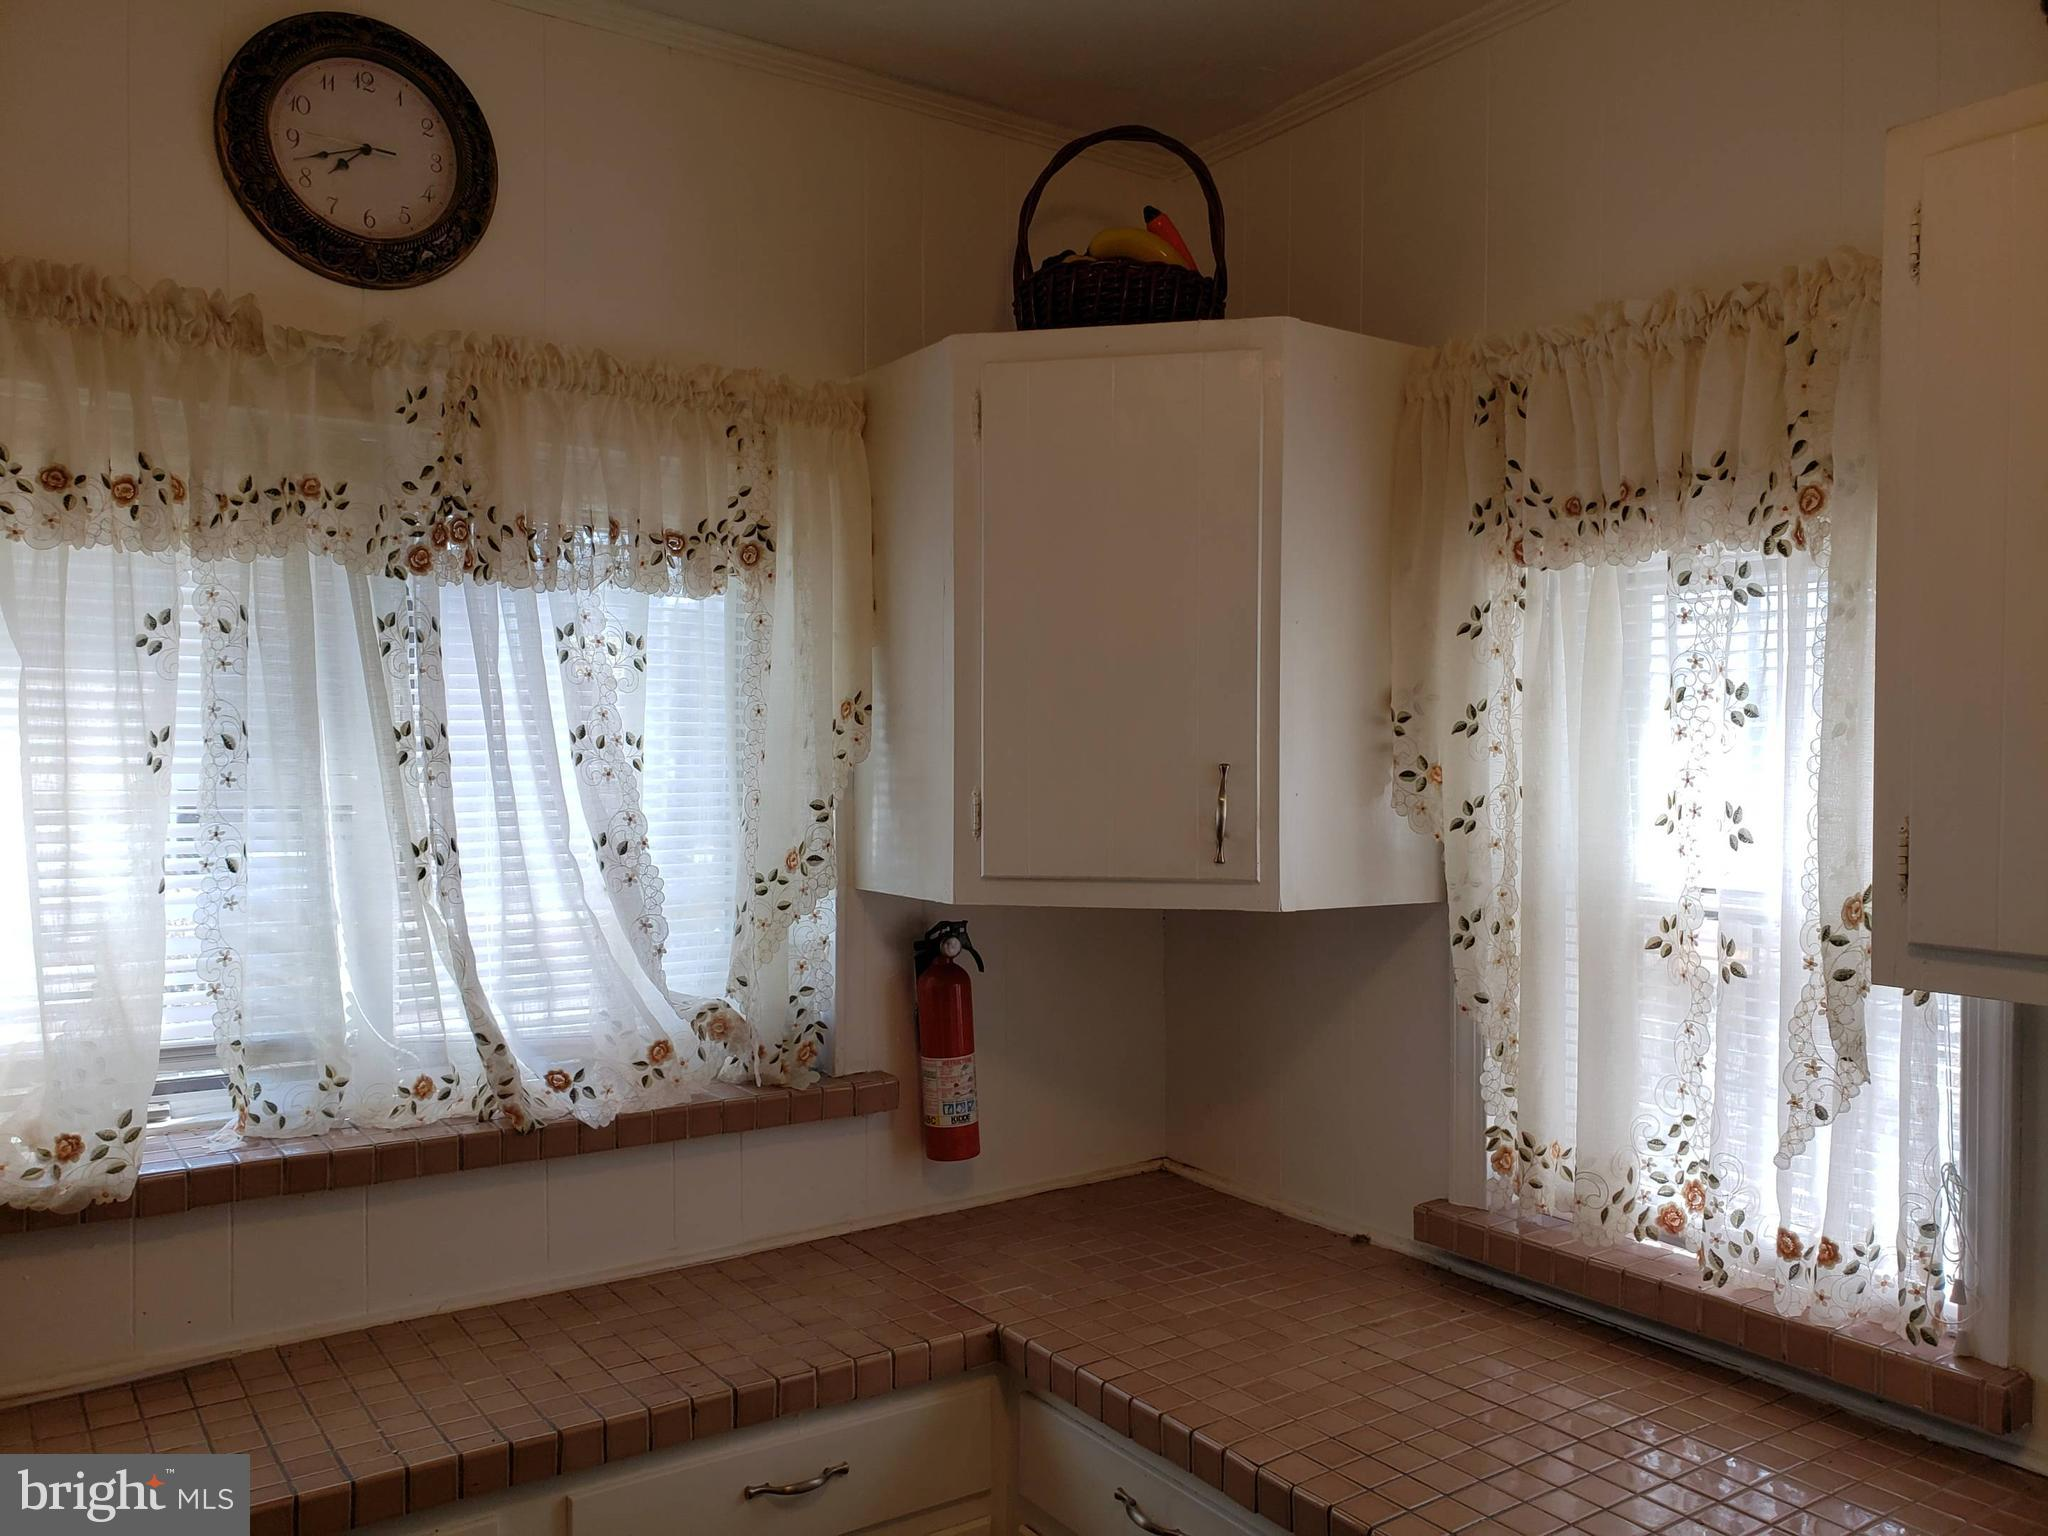 Kitchen windows-lots of light